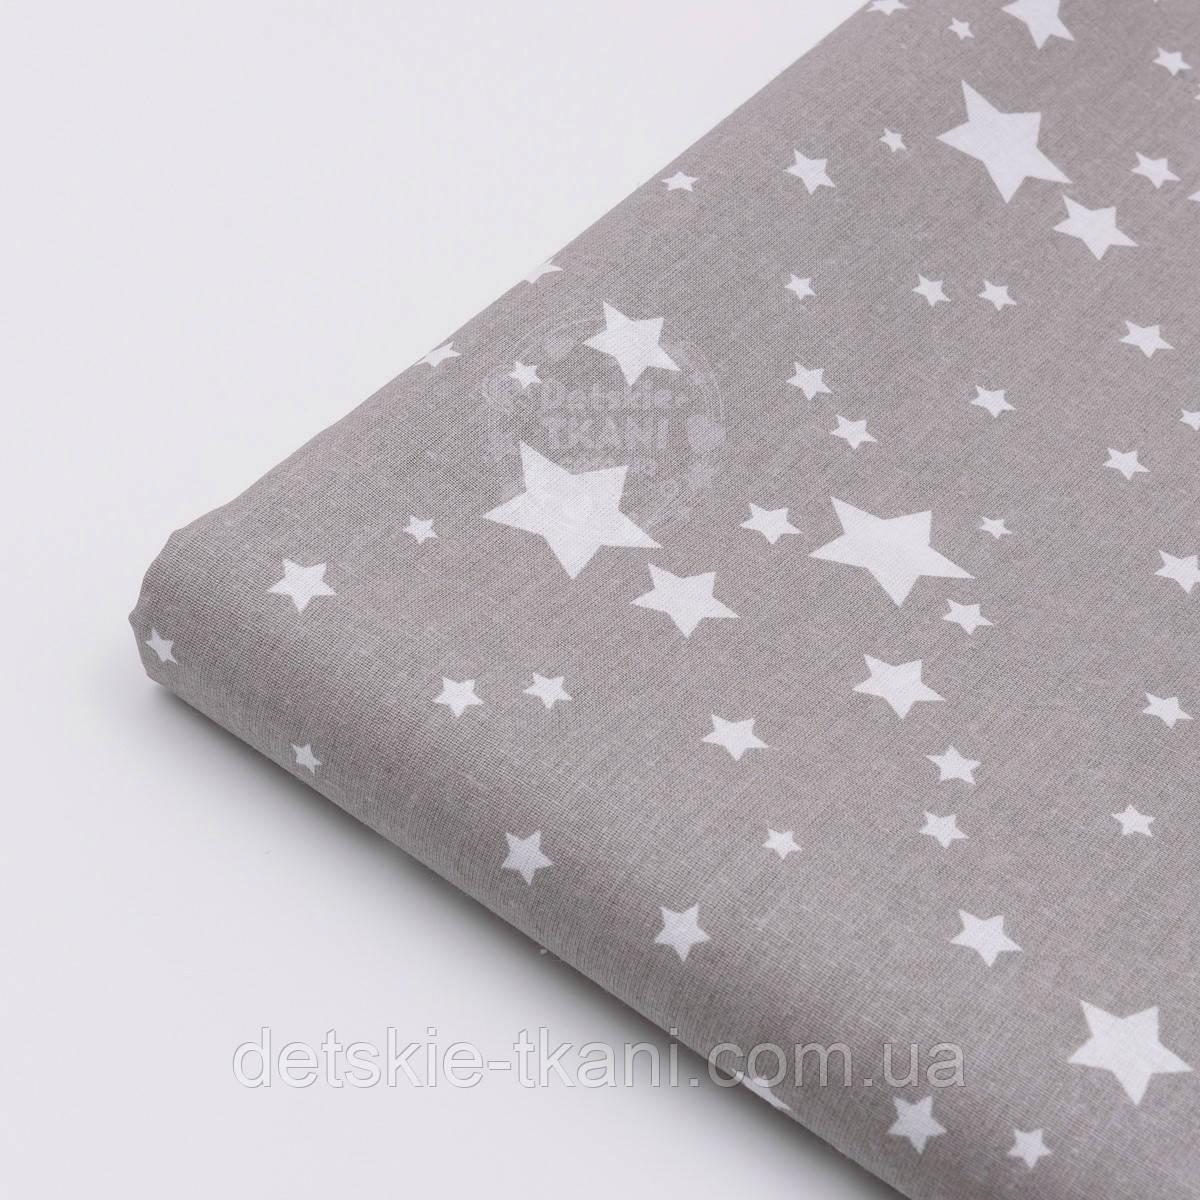 "Лоскут ткани ""Мини галактика"" белая на сером фоне № 1459"